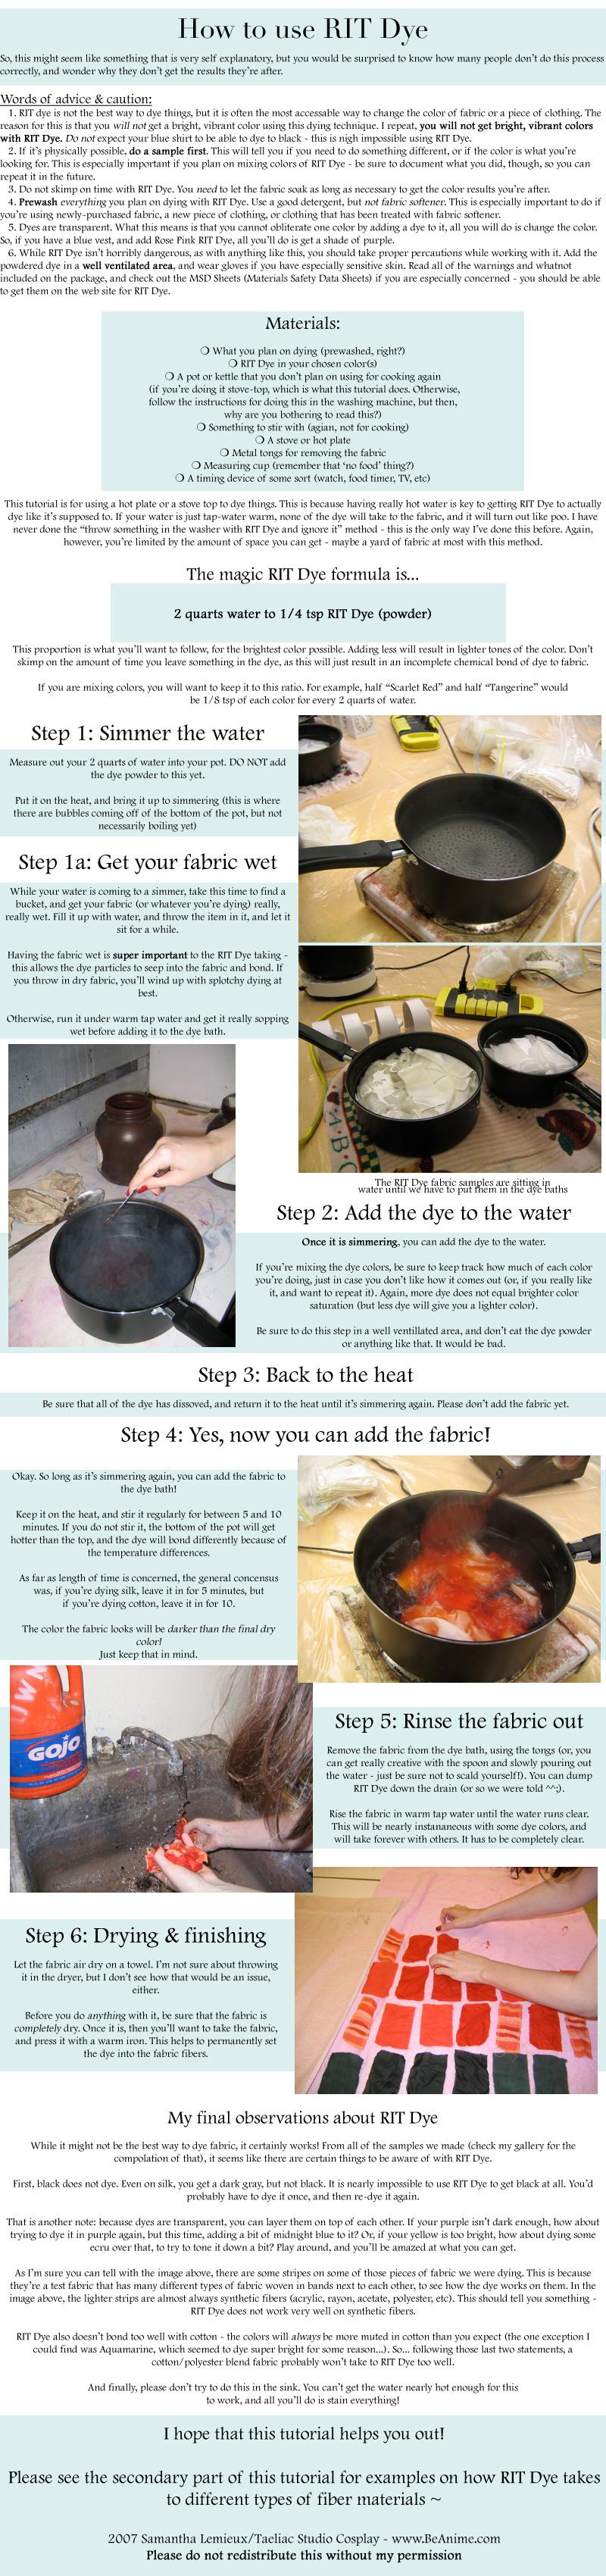 Tutorial: How to use RIT Dye by taeliac